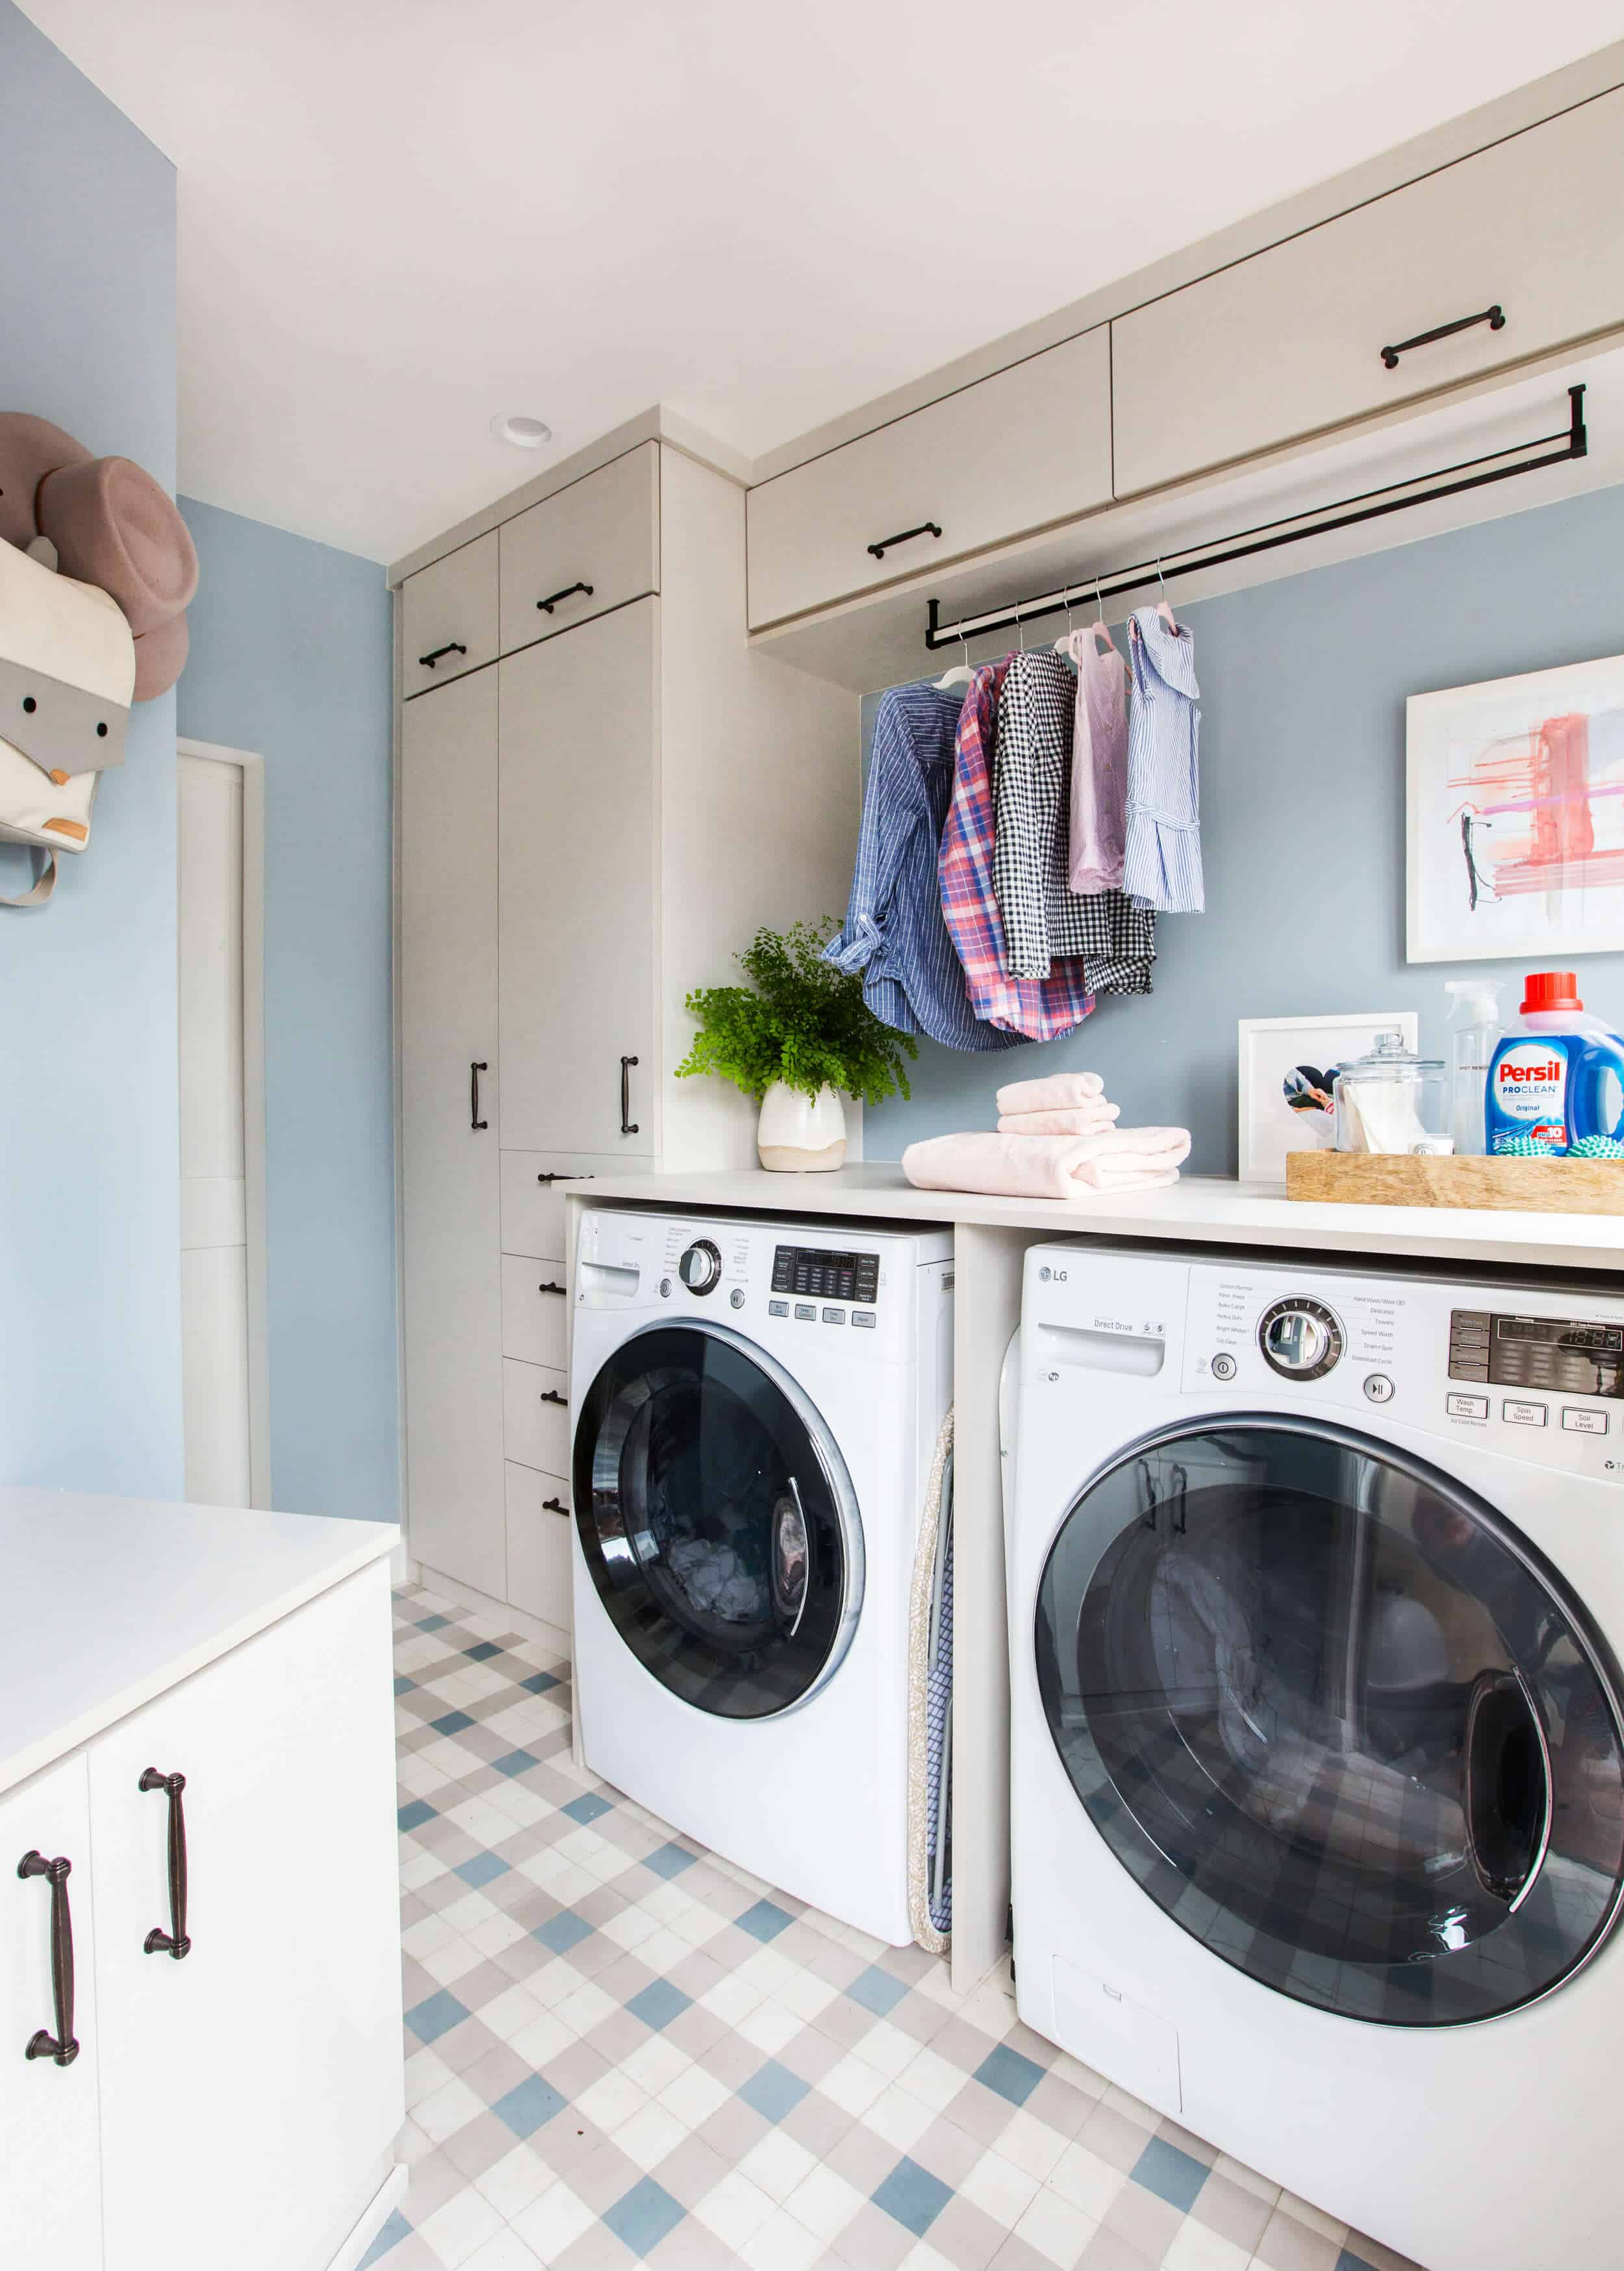 Emily-Henderson_Modern-English-Cottage_Laundry-Room_Persil_California-Closets_Photos_16